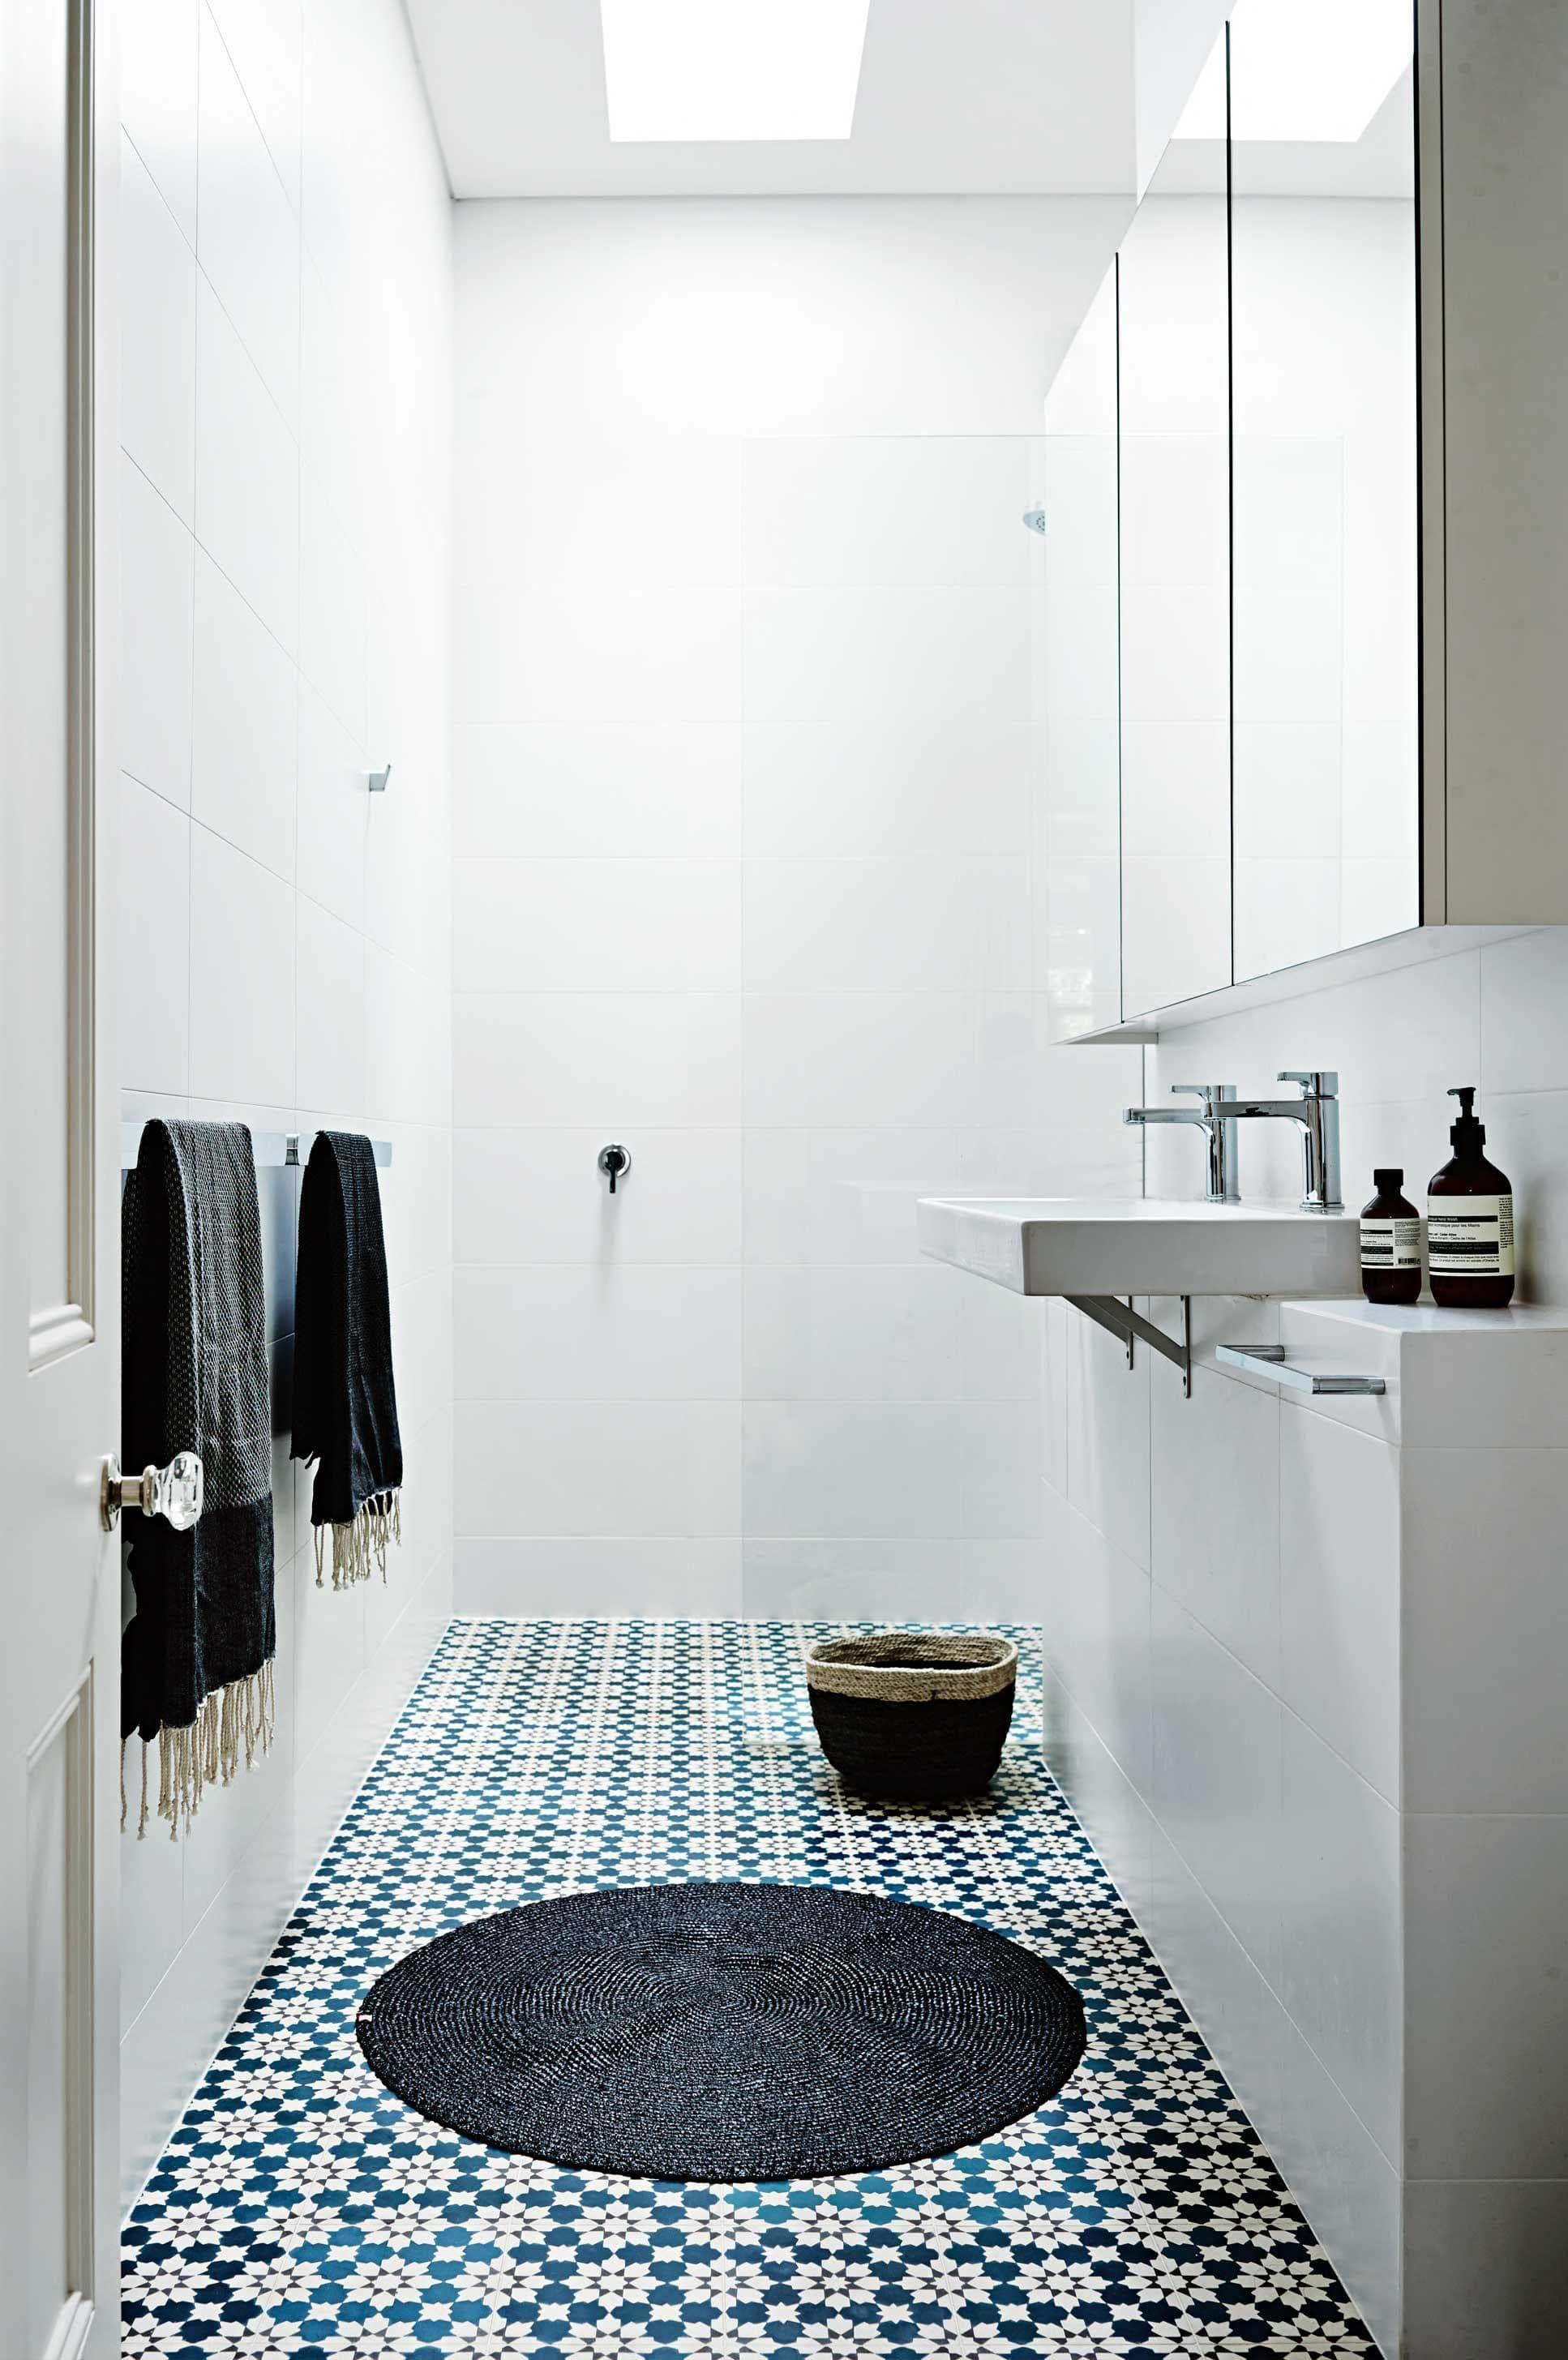 Tile Inspiration For A Striking Bathroom With Images Bathroom Layout Small Bathroom Narrow Bathroom Designs